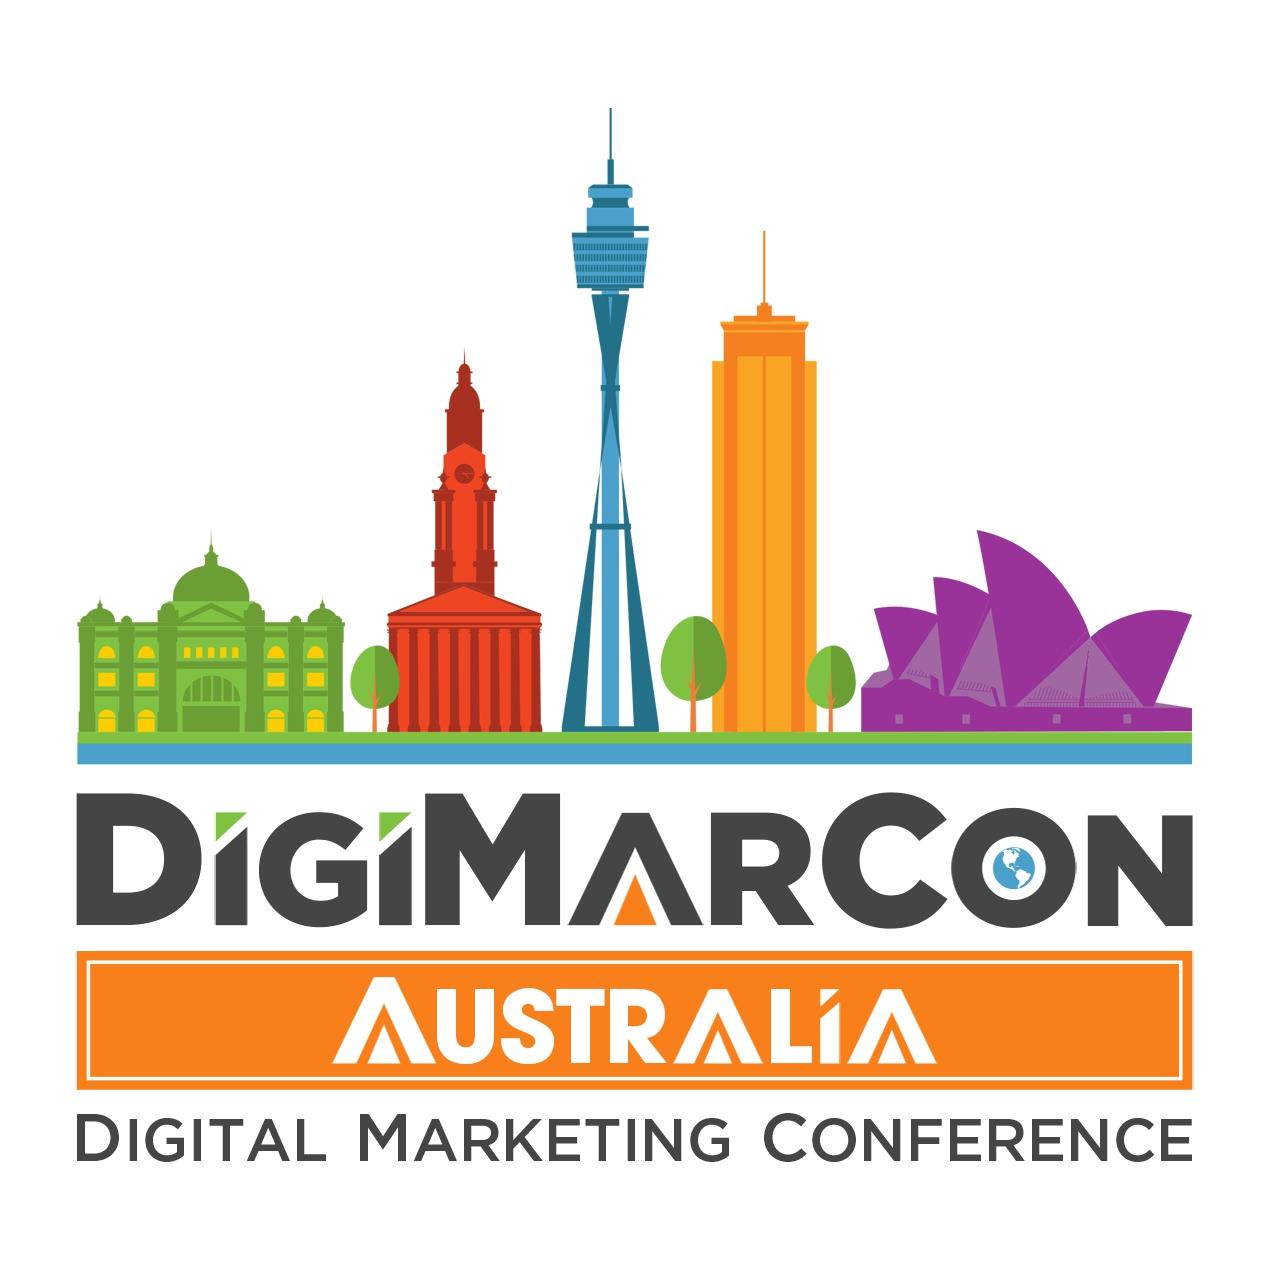 DigiMarCon Australia 2021 - Digital Marketing, Media and Advertising Conference & Exhibition